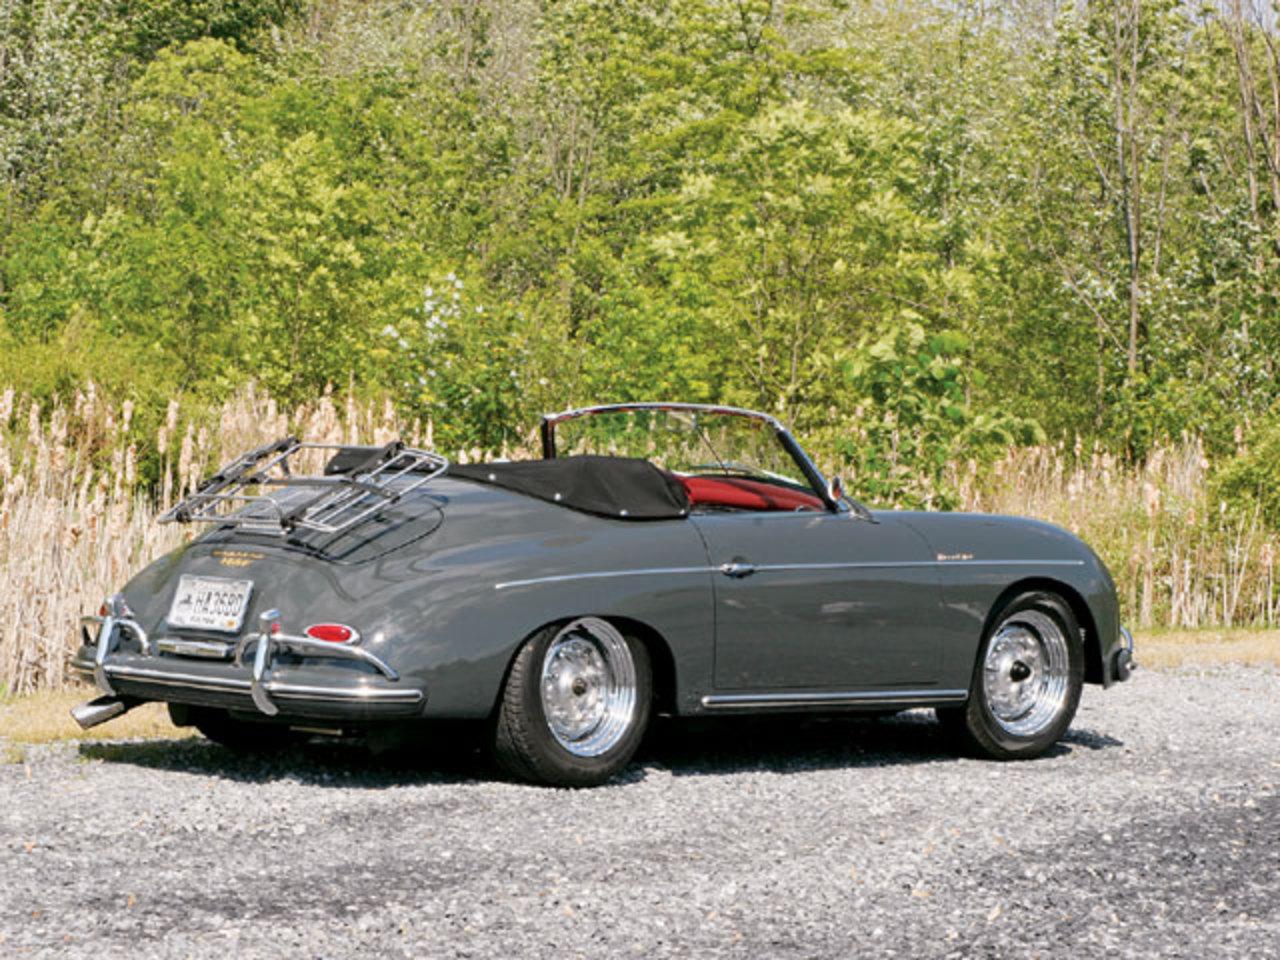 topworldauto photos of porsche 356 speedster replica photo galleries. Black Bedroom Furniture Sets. Home Design Ideas